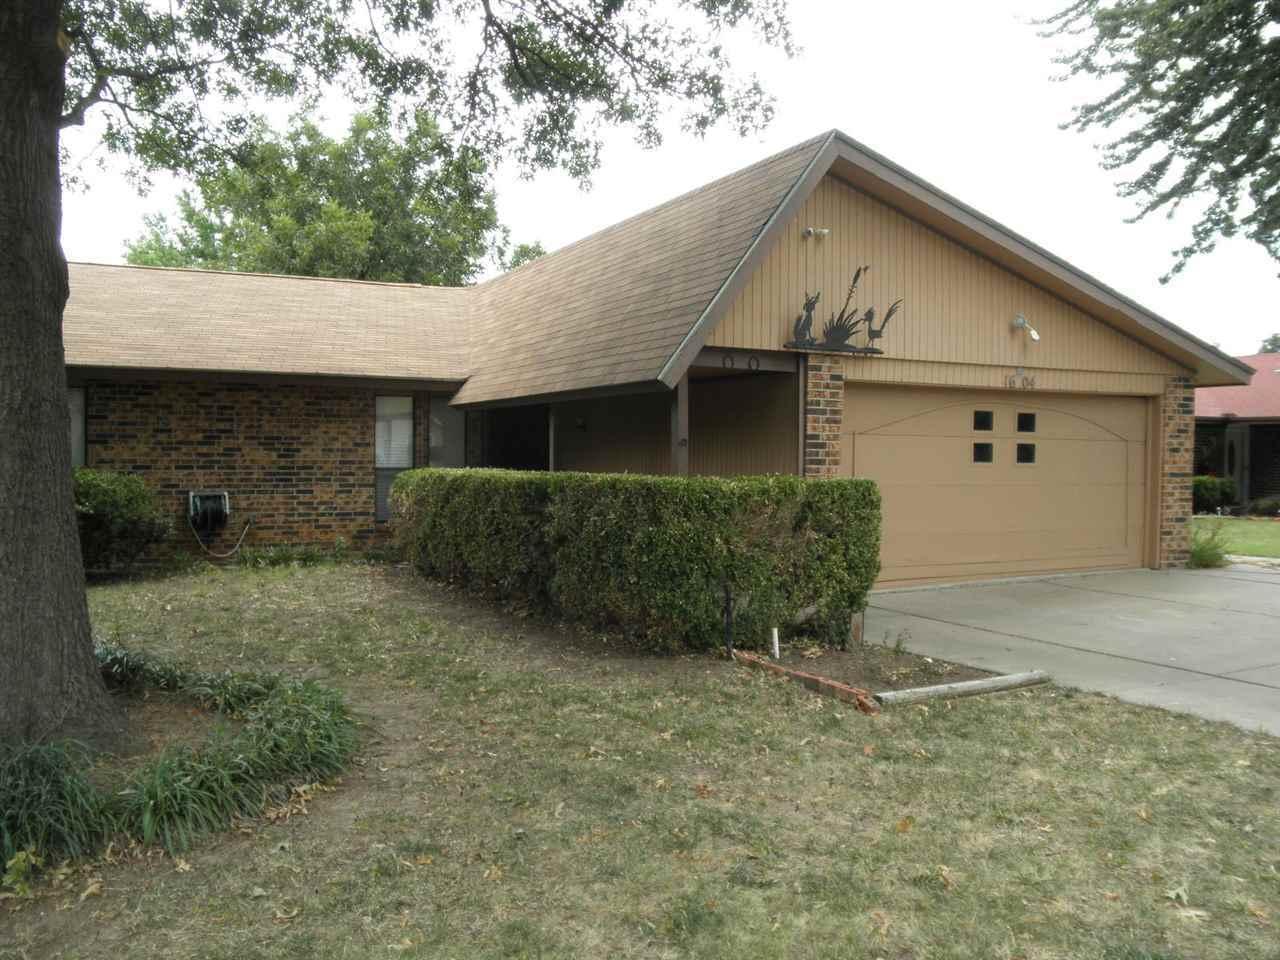 Sold Cross Sale W/ MLS | 1604 E Prospect  Ponca City, OK 74604 1